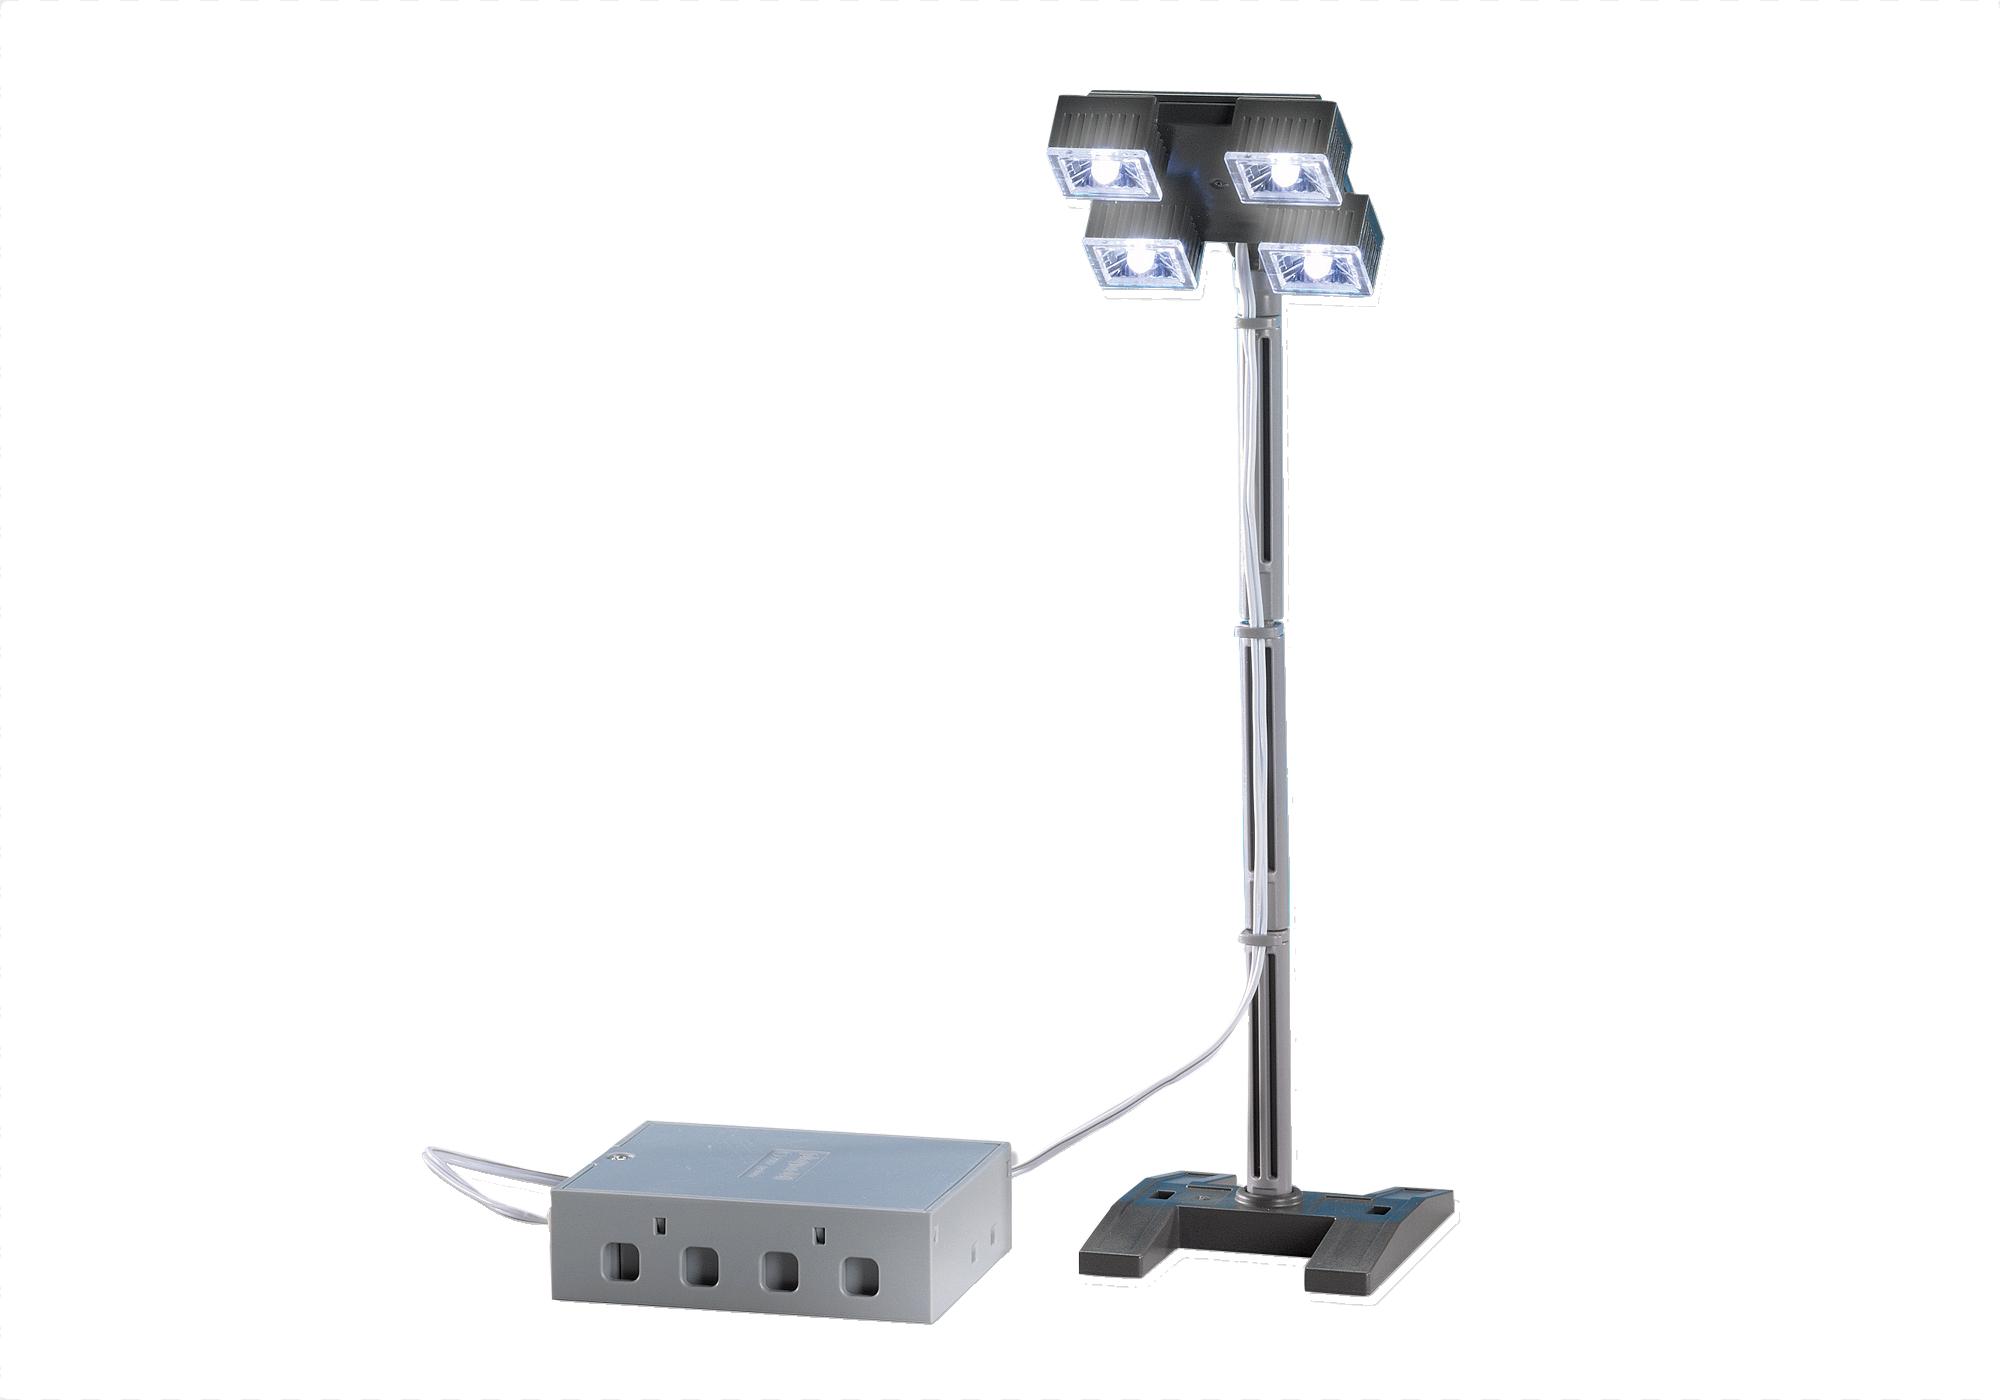 http://media.playmobil.com/i/playmobil/7445_product_detail/Teleskoplampe